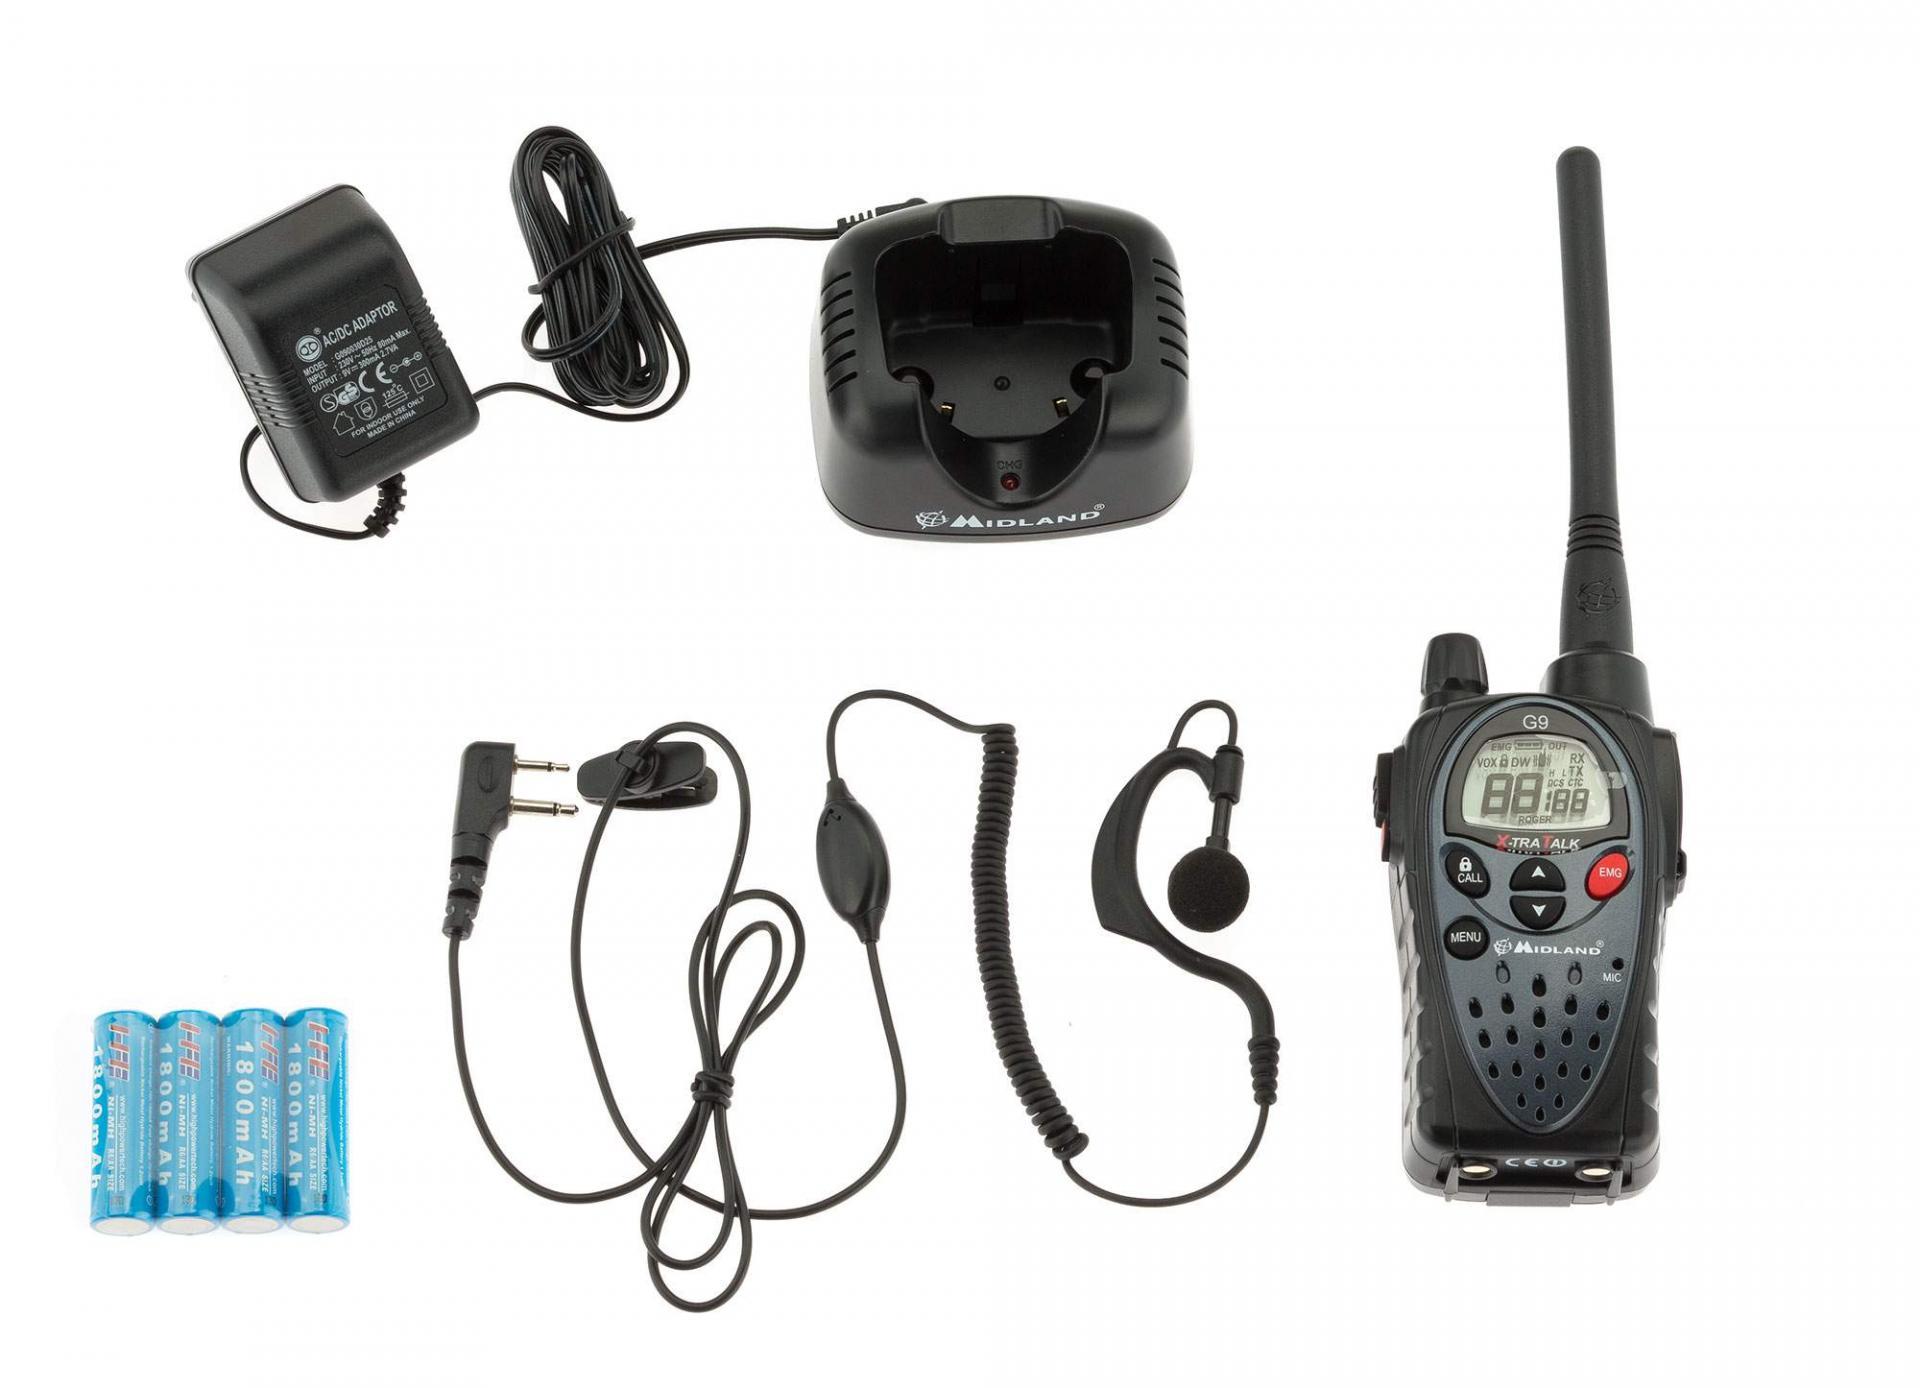 Talkie walkie midland g9 avec kit oreillette bi band double ptt